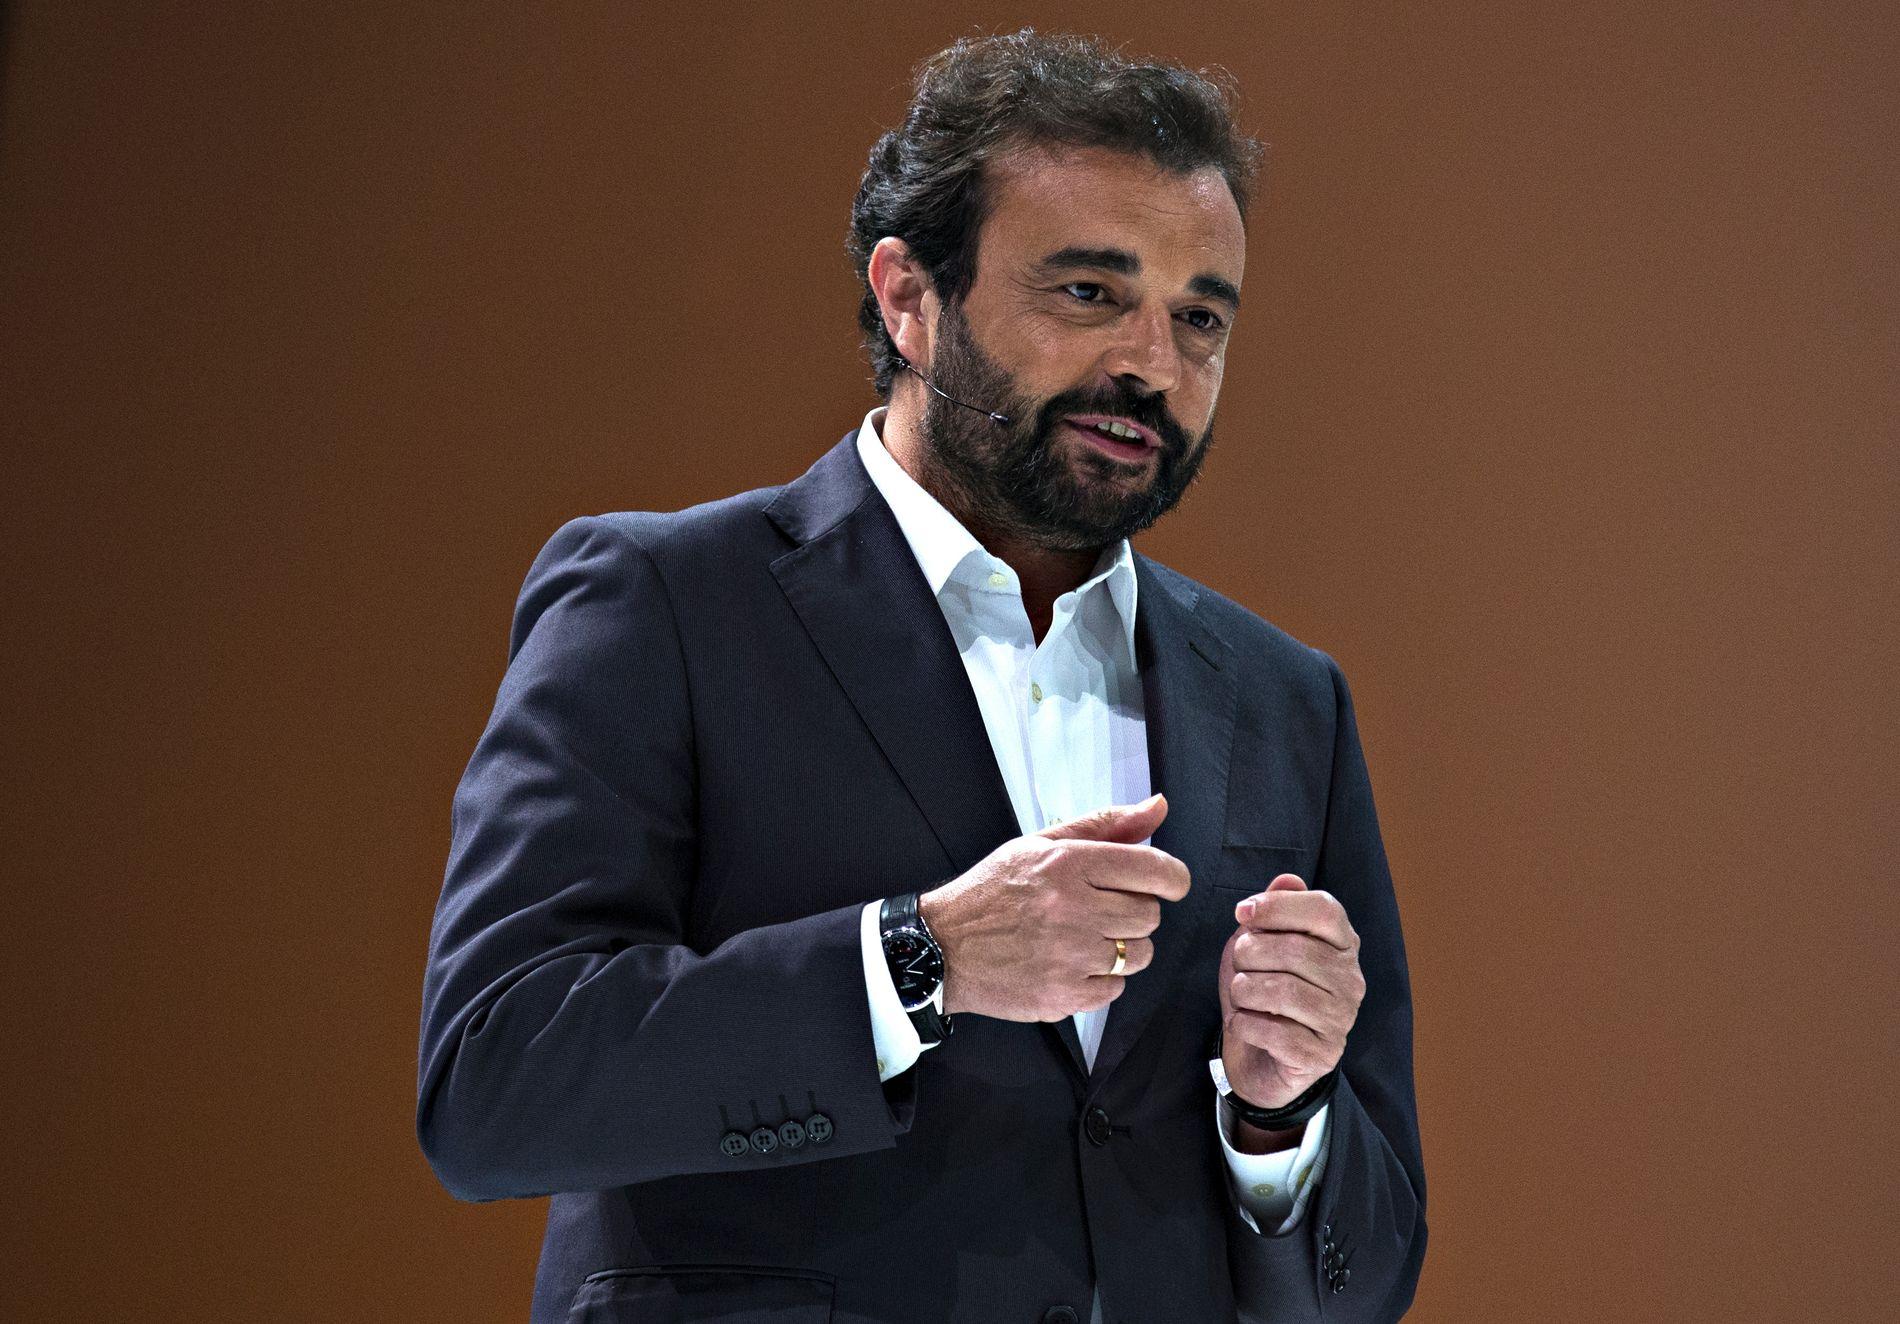 MEKTIG: Real Madrids klubbdirektør José Ángel Sánchez, her fra en Microsoft-konferanse i Chicago i 2015.